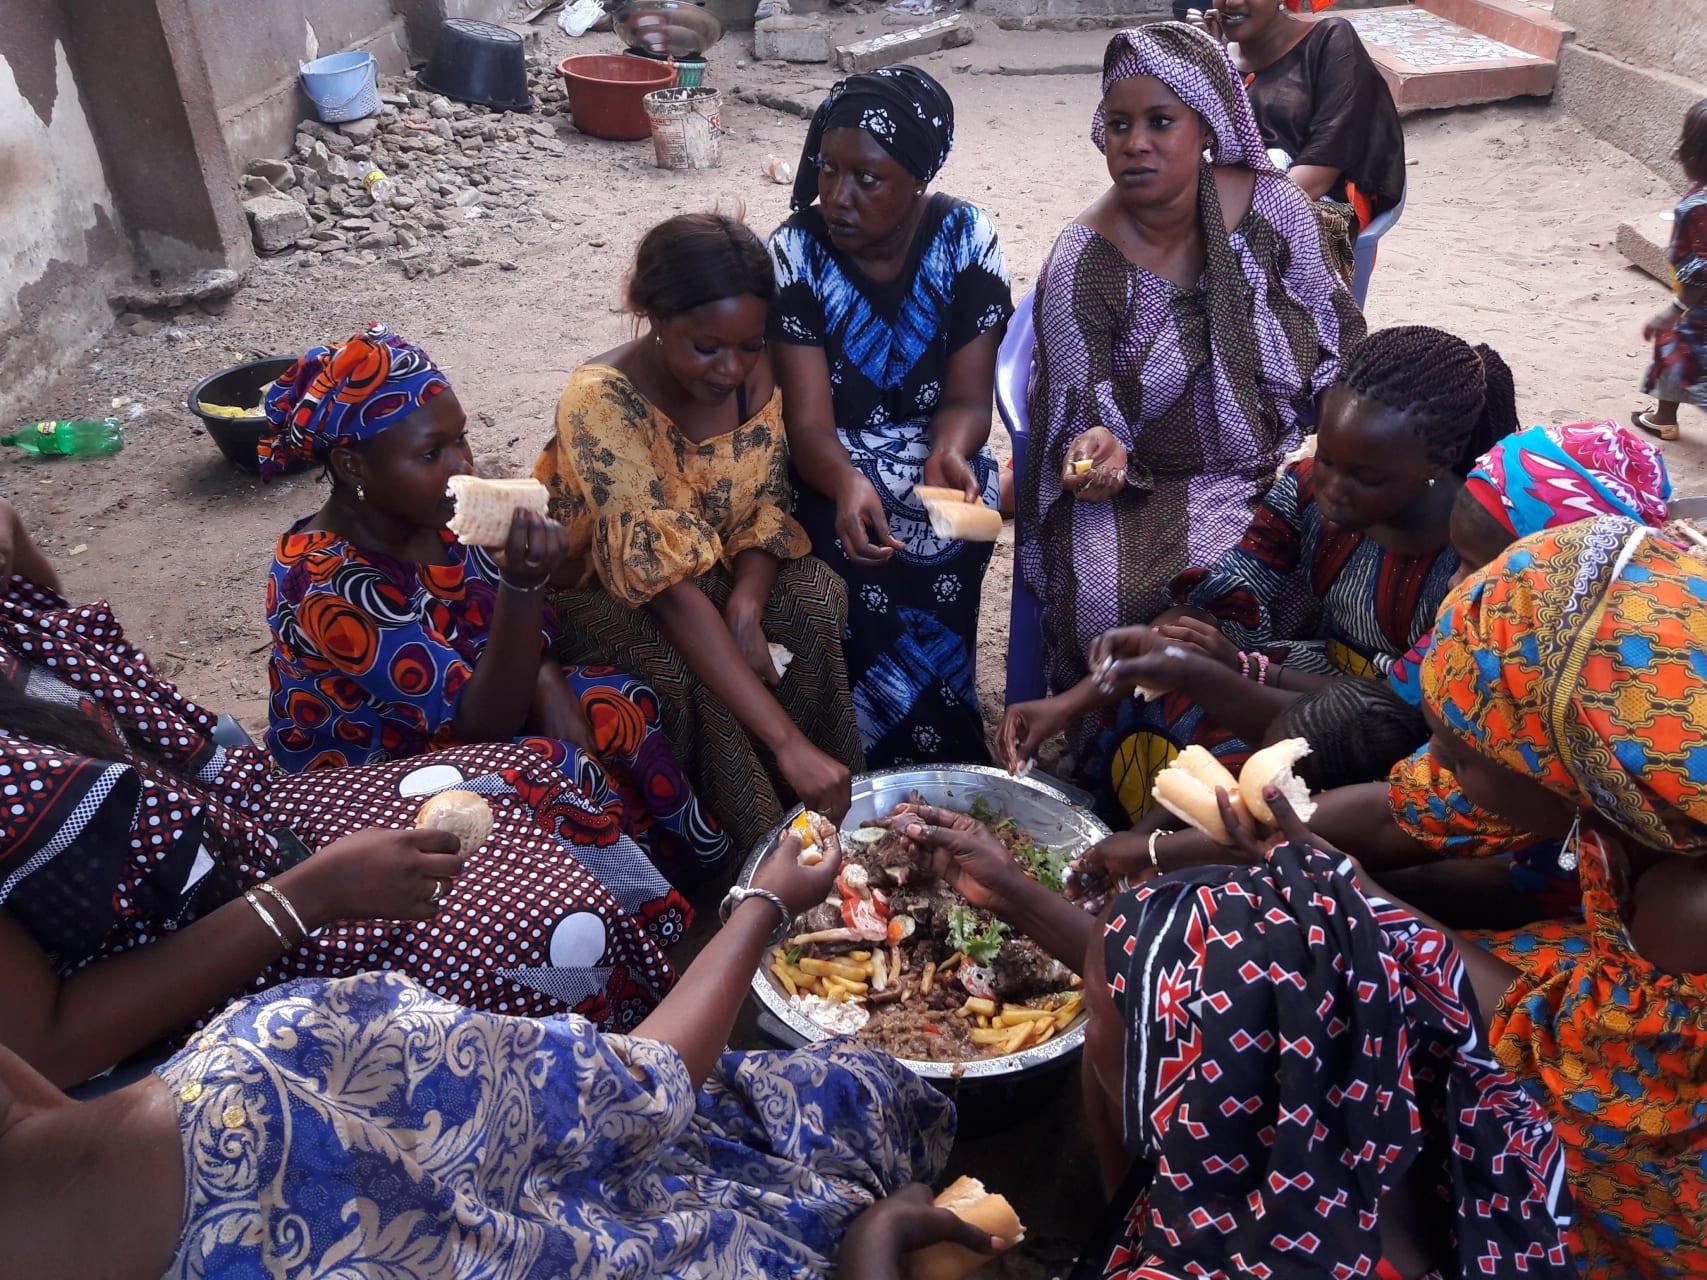 Mbour - Festive Celebration of the End of Ramadan in Sénégal